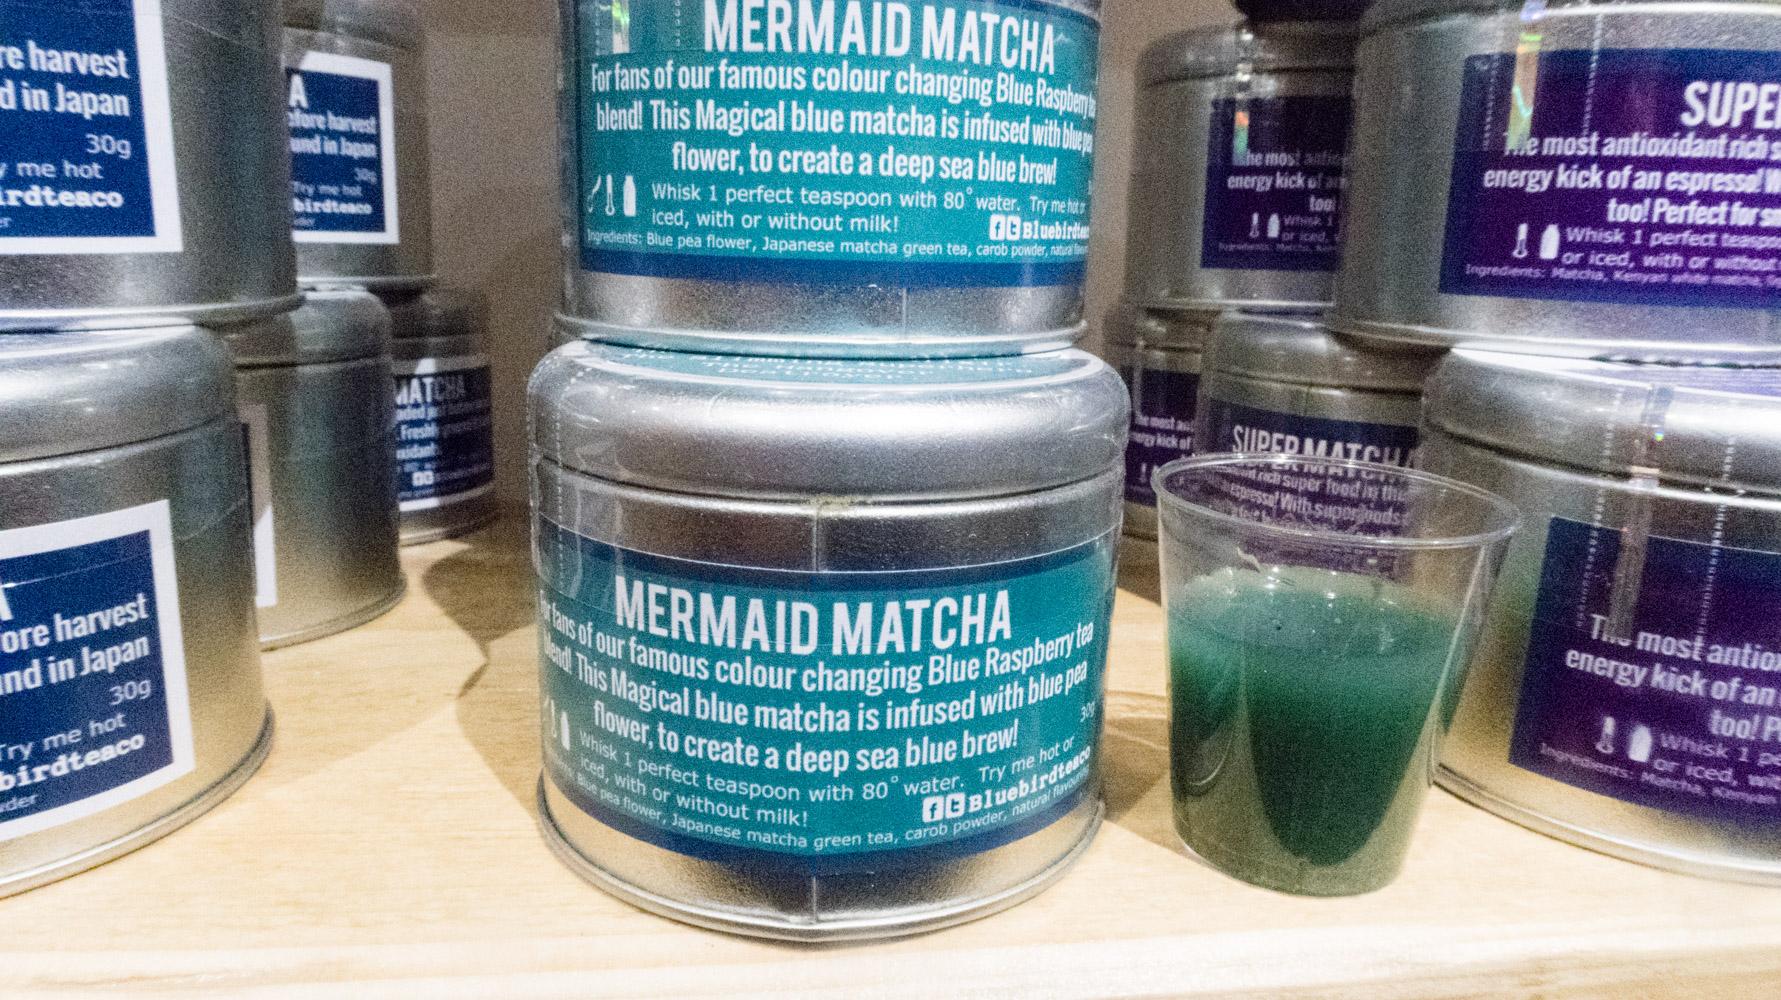 Mermaid matcha